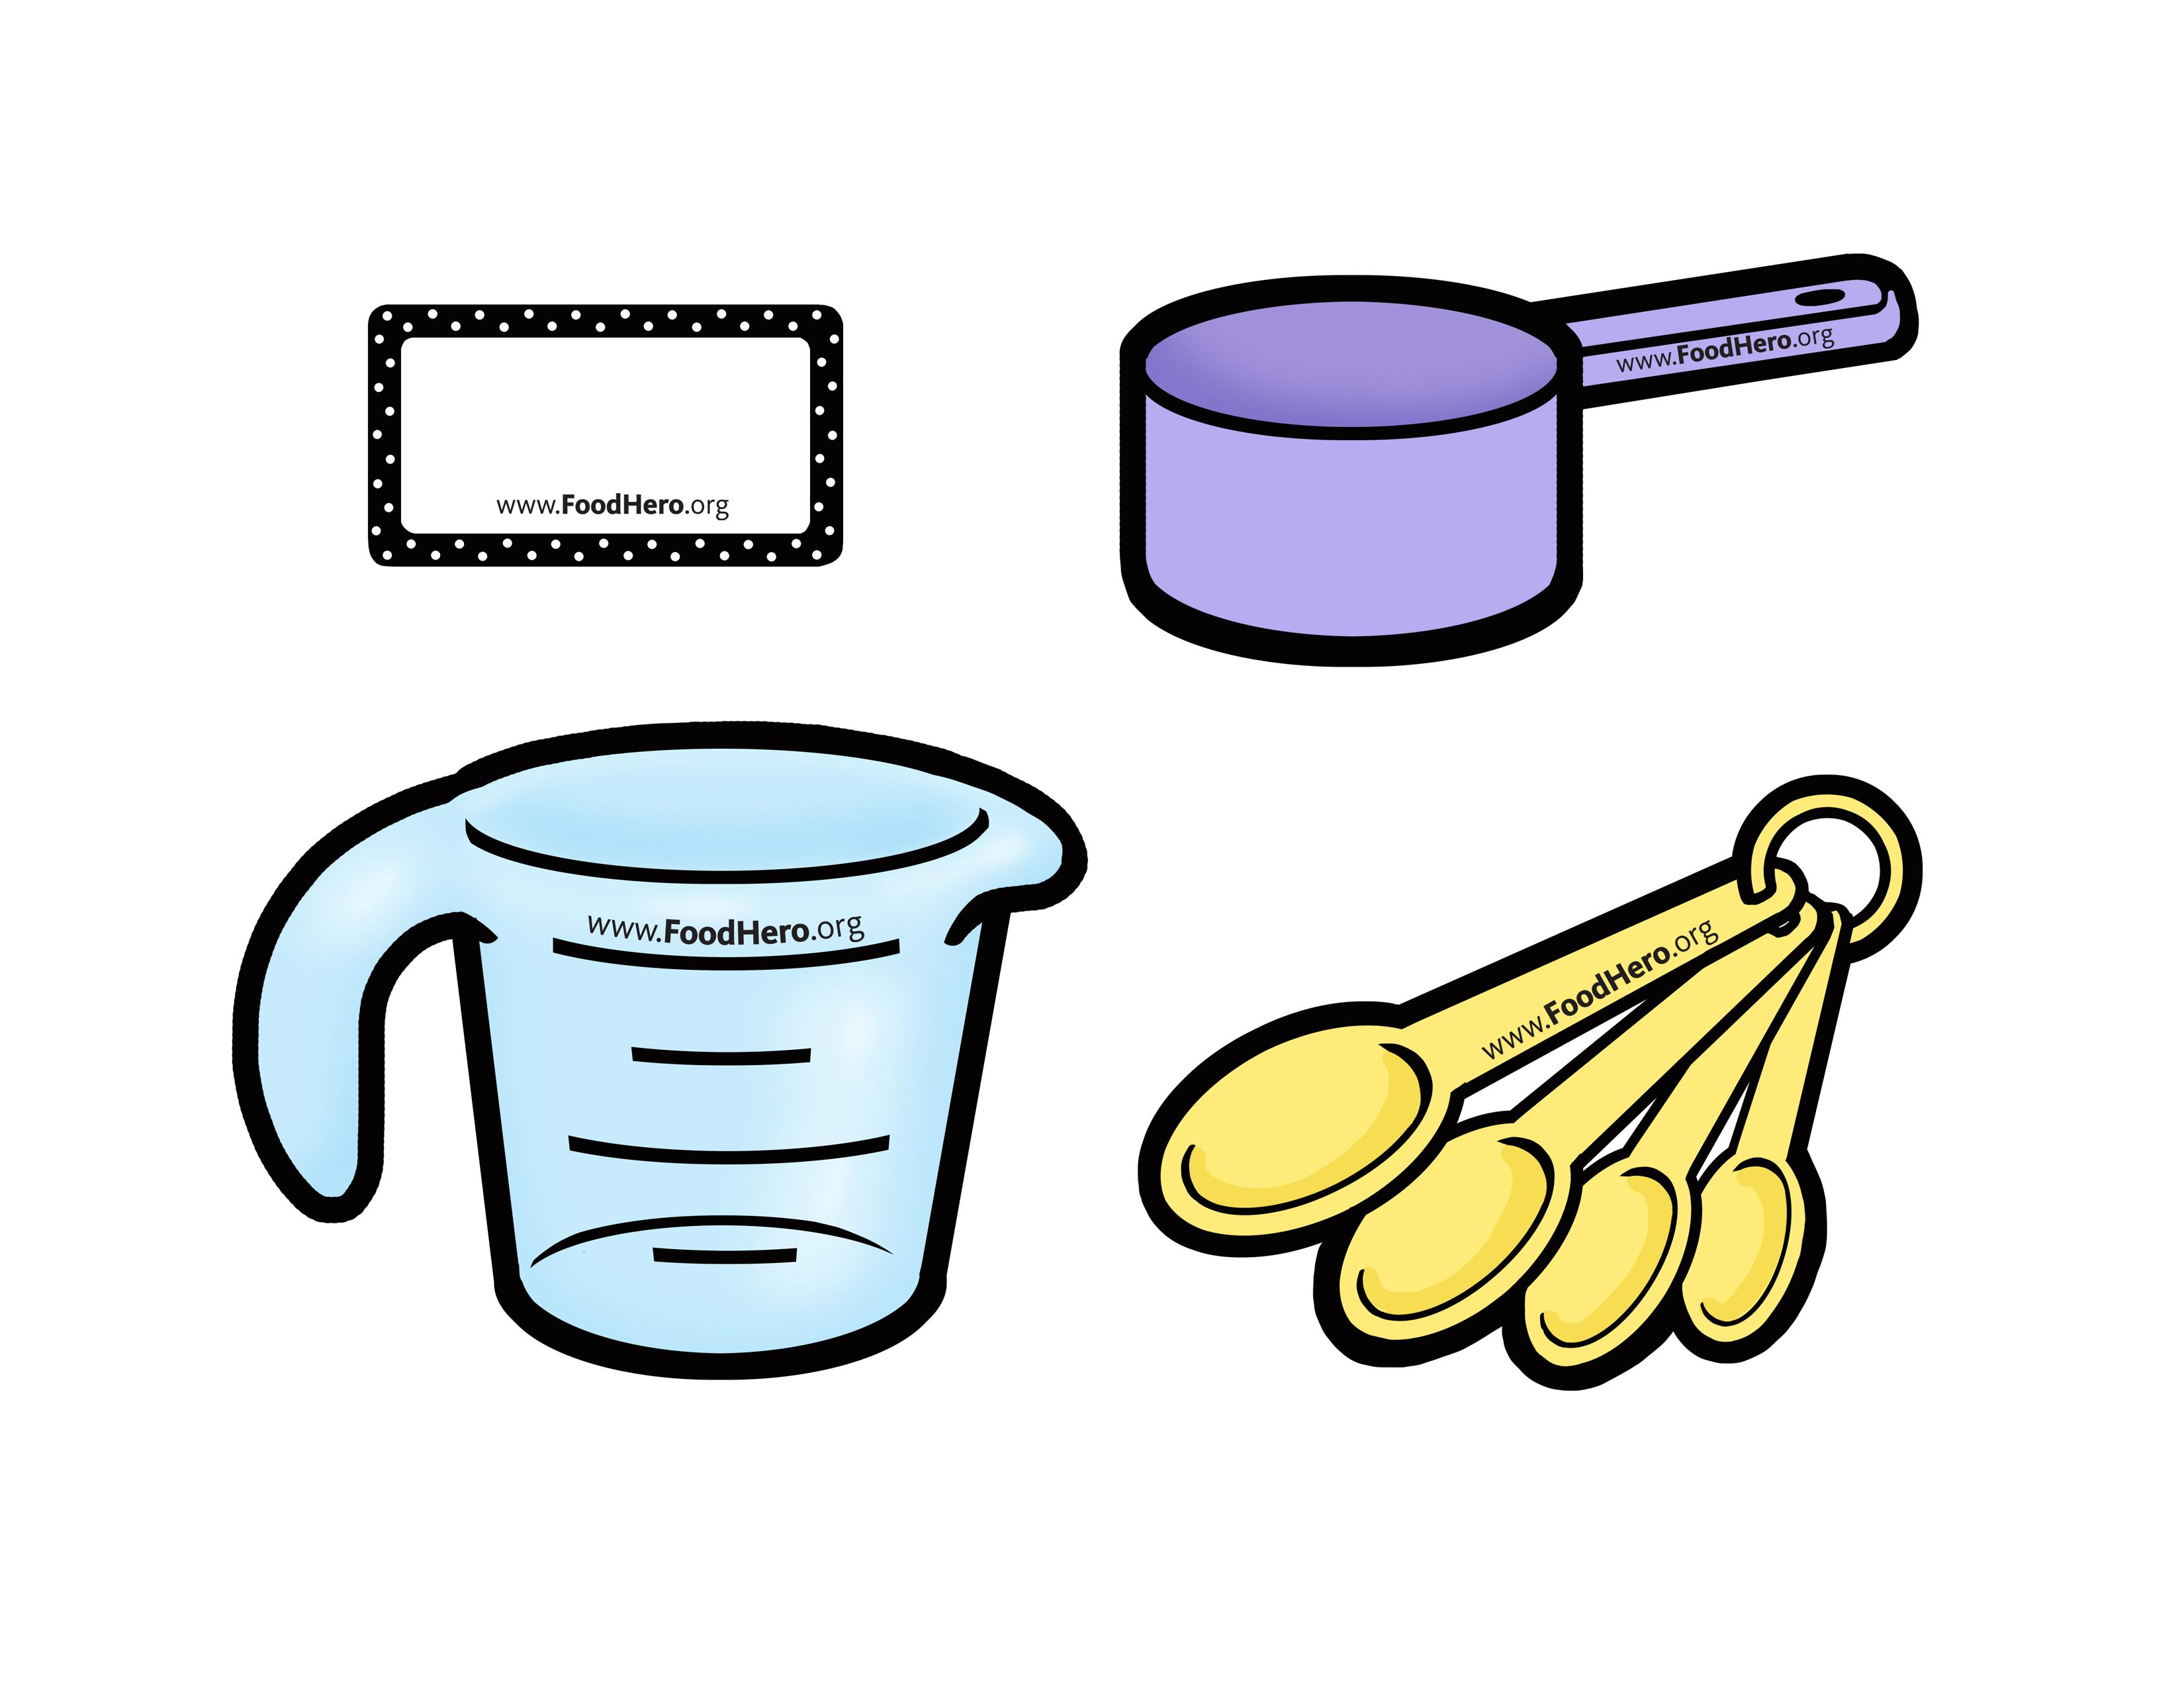 3300x2550 Kitchen Tools Food Hero